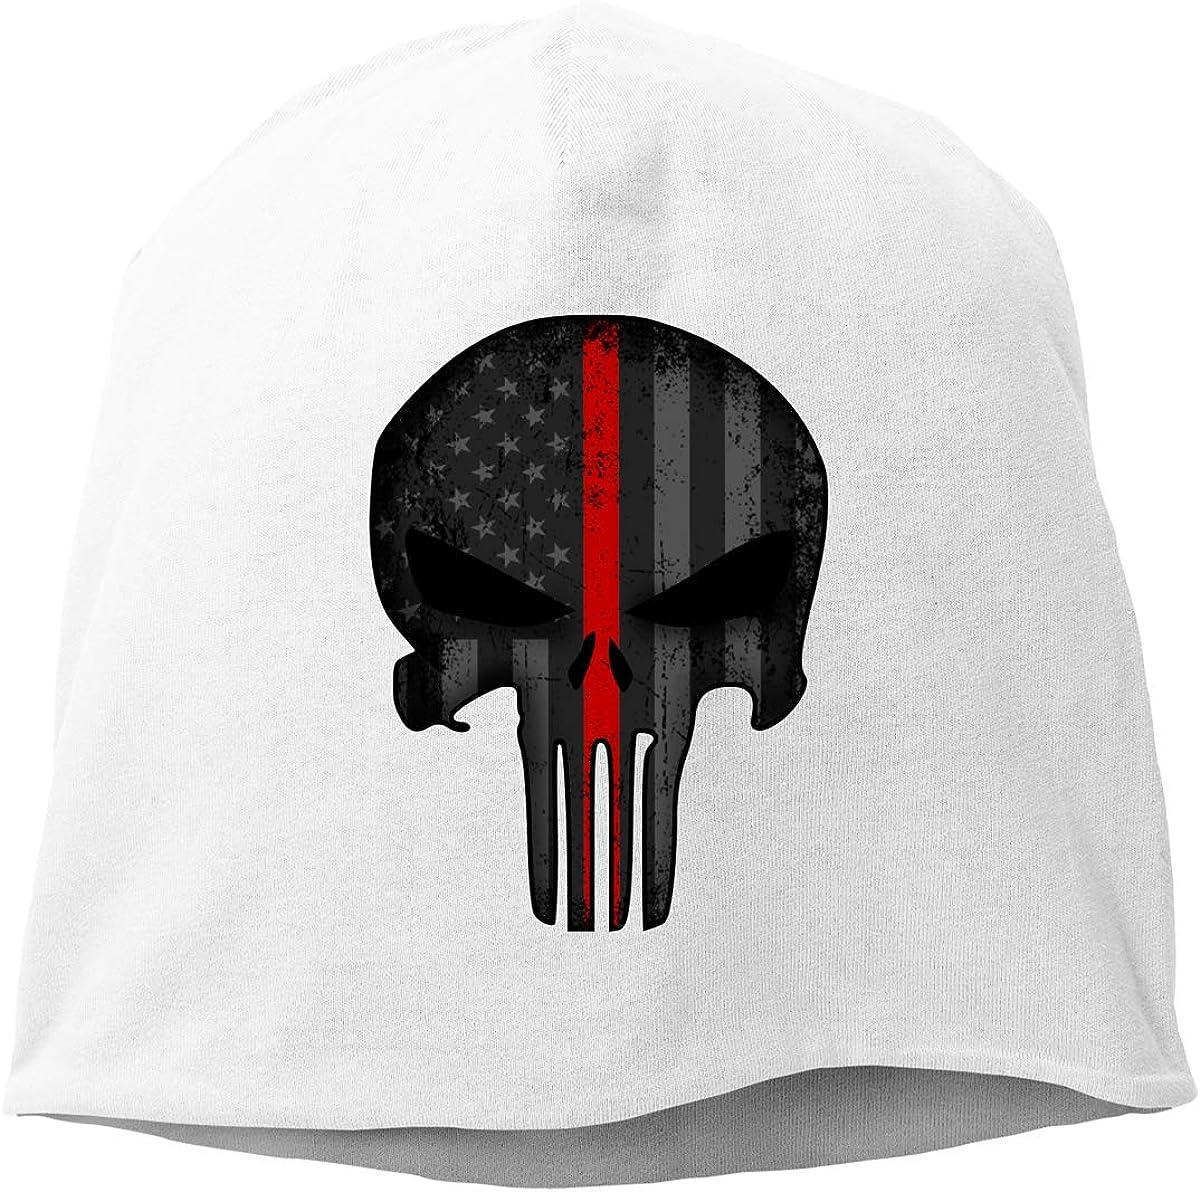 Firefighter American Flag Thin Red Line Skull Cap Helmet Liner Beanie Cap for Men Hip Hop Hedging Head Hat